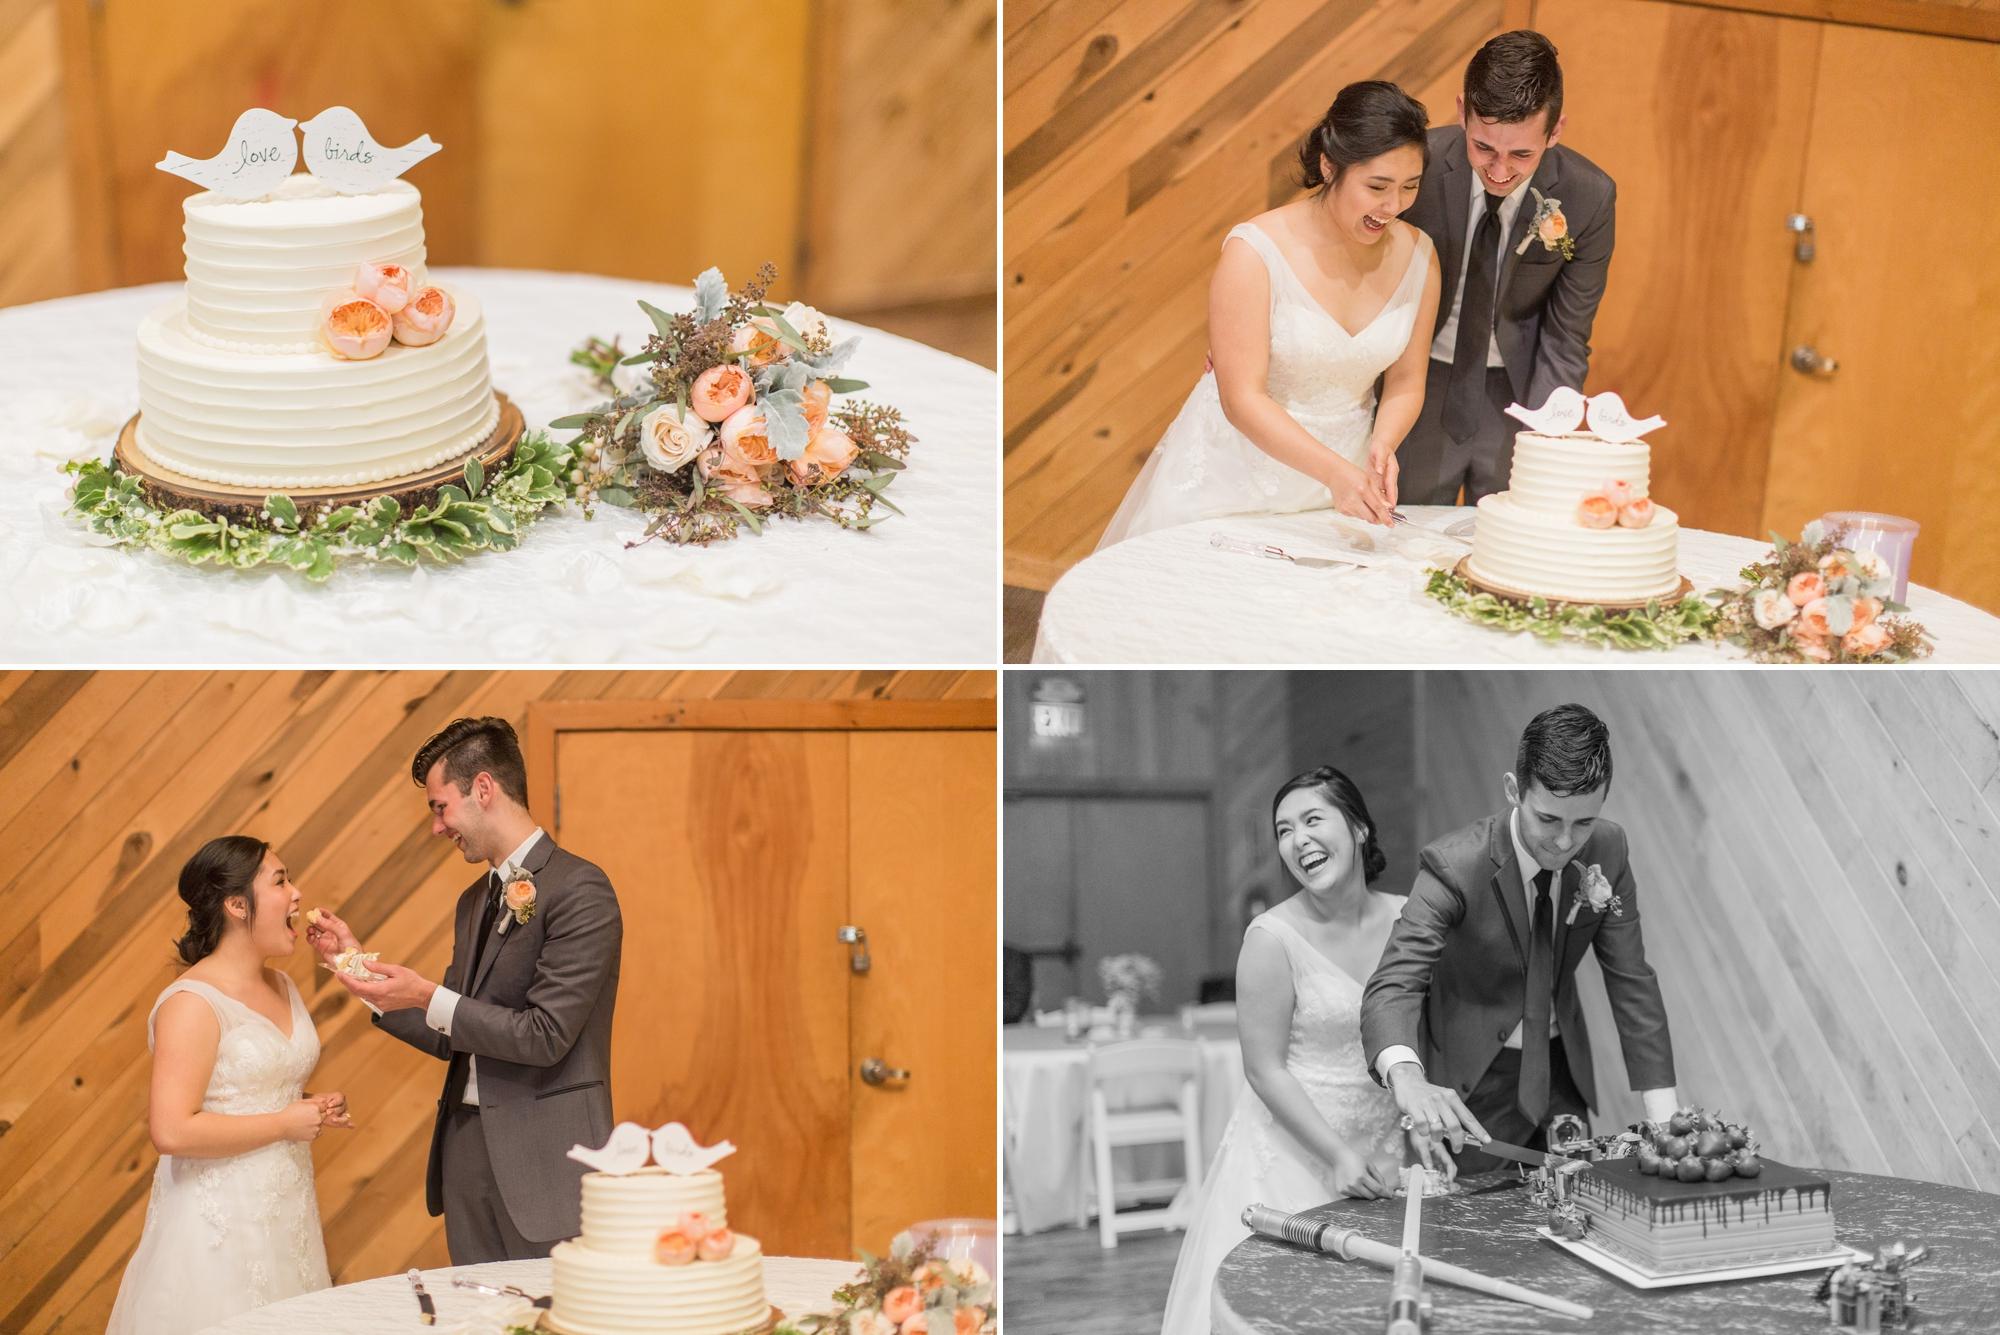 giles wedding blog 46.jpg